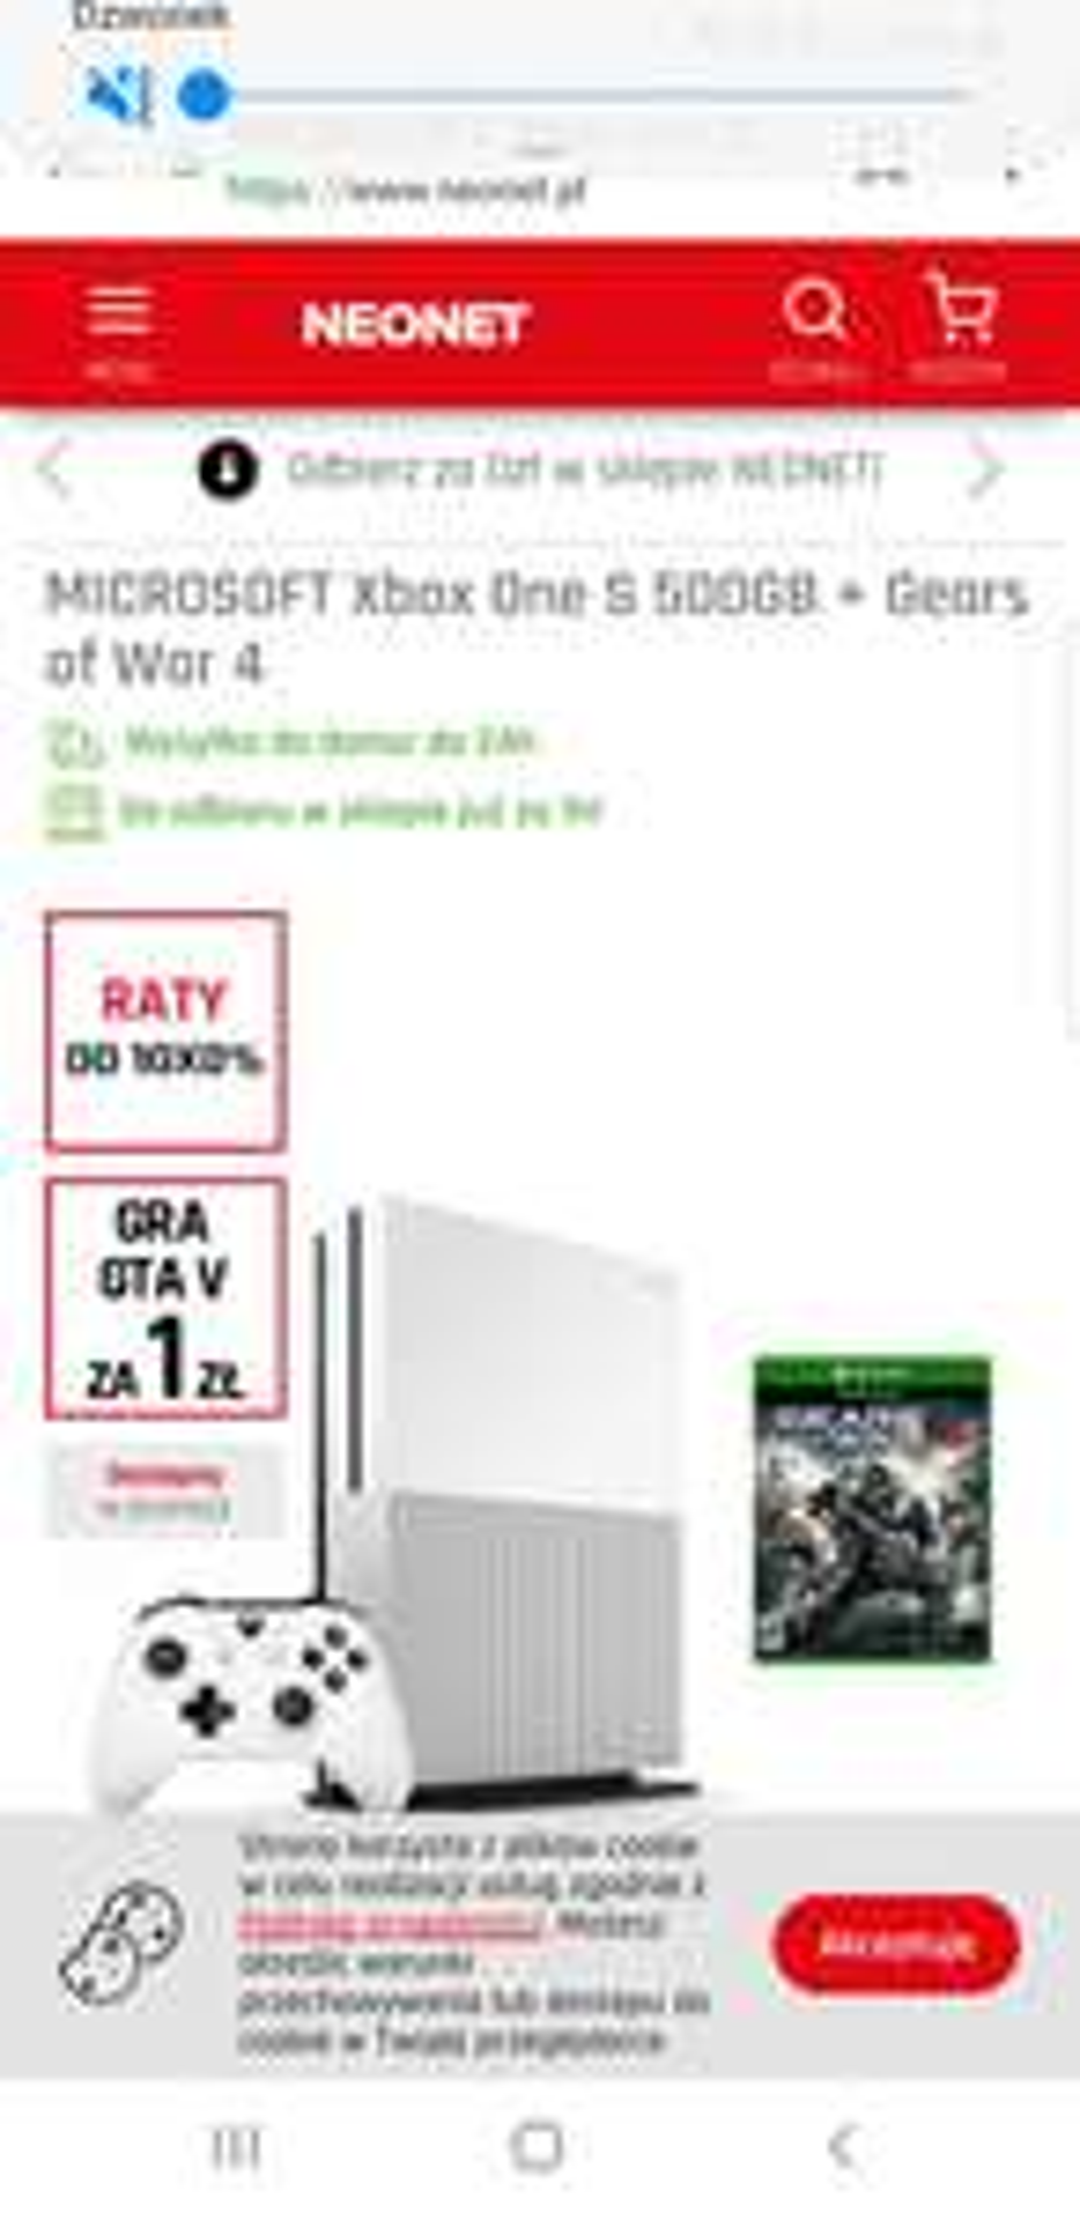 Xbox one S 500 neonet +gears of war 4